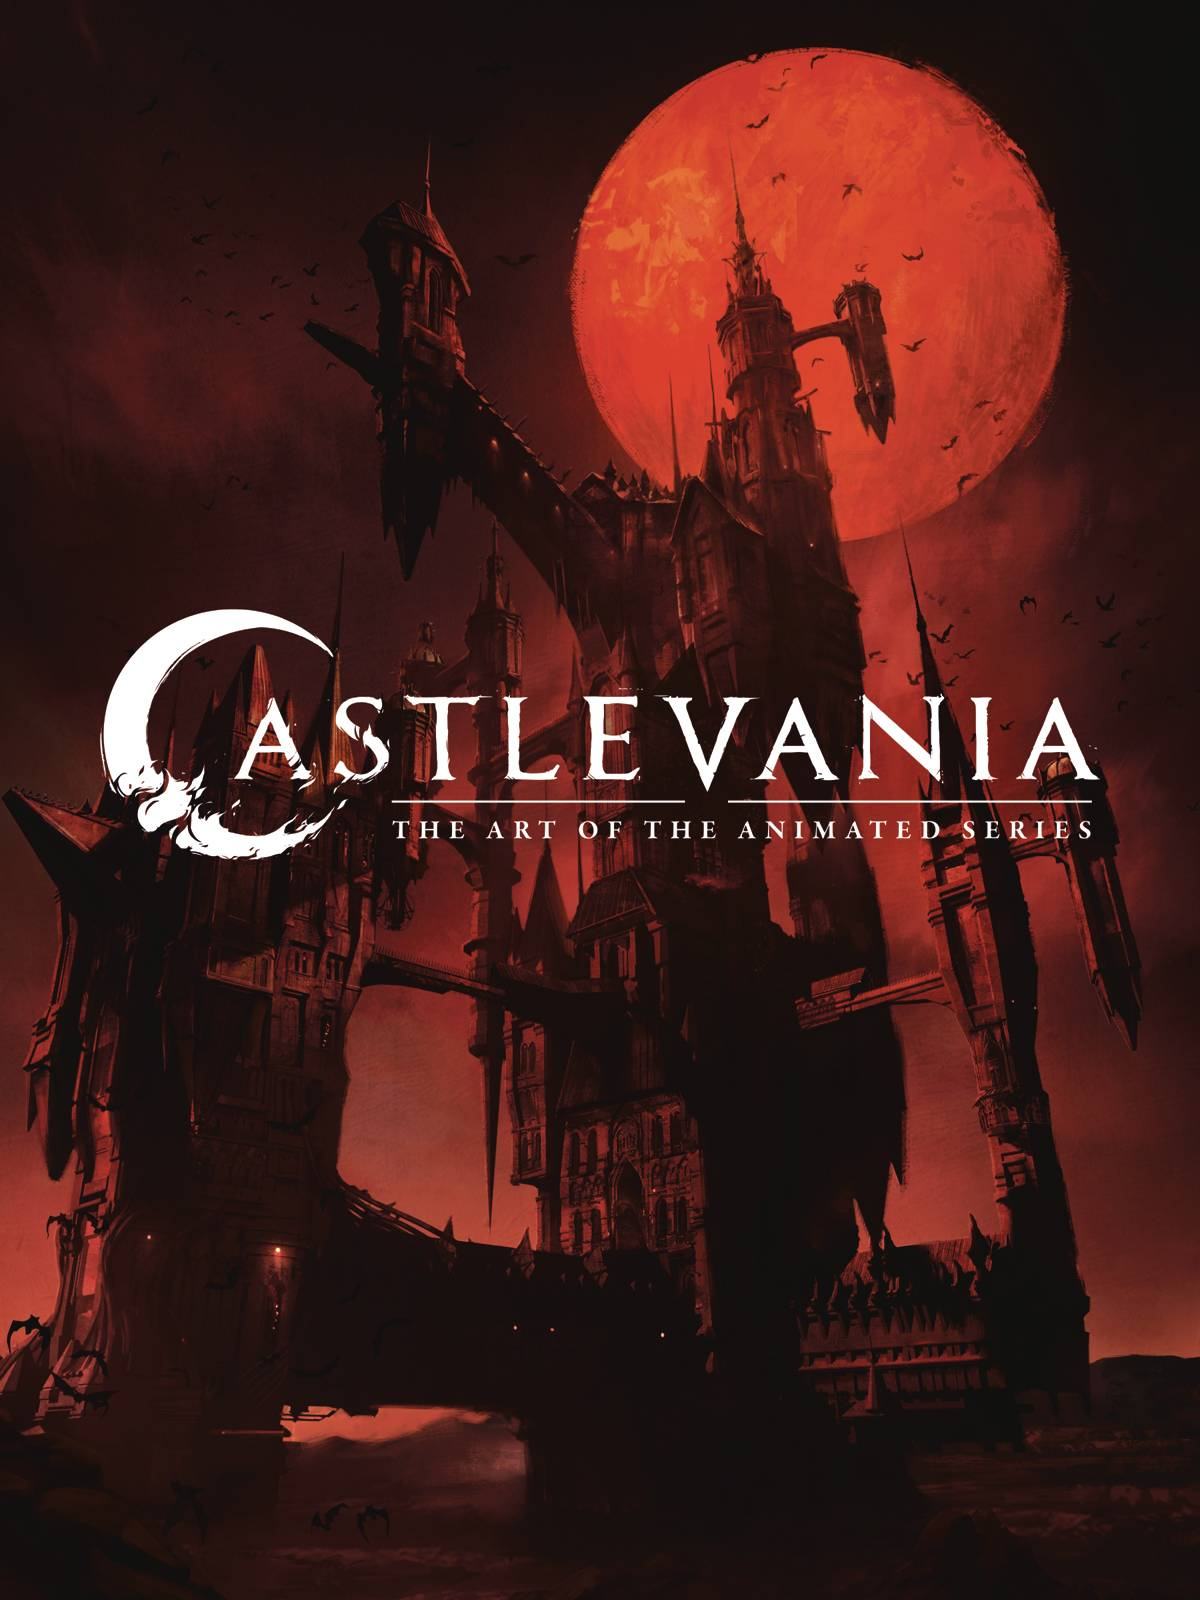 B-458 Castlevania Season 2 2019 Animated TV Series Art Silk Poster 21 24x36